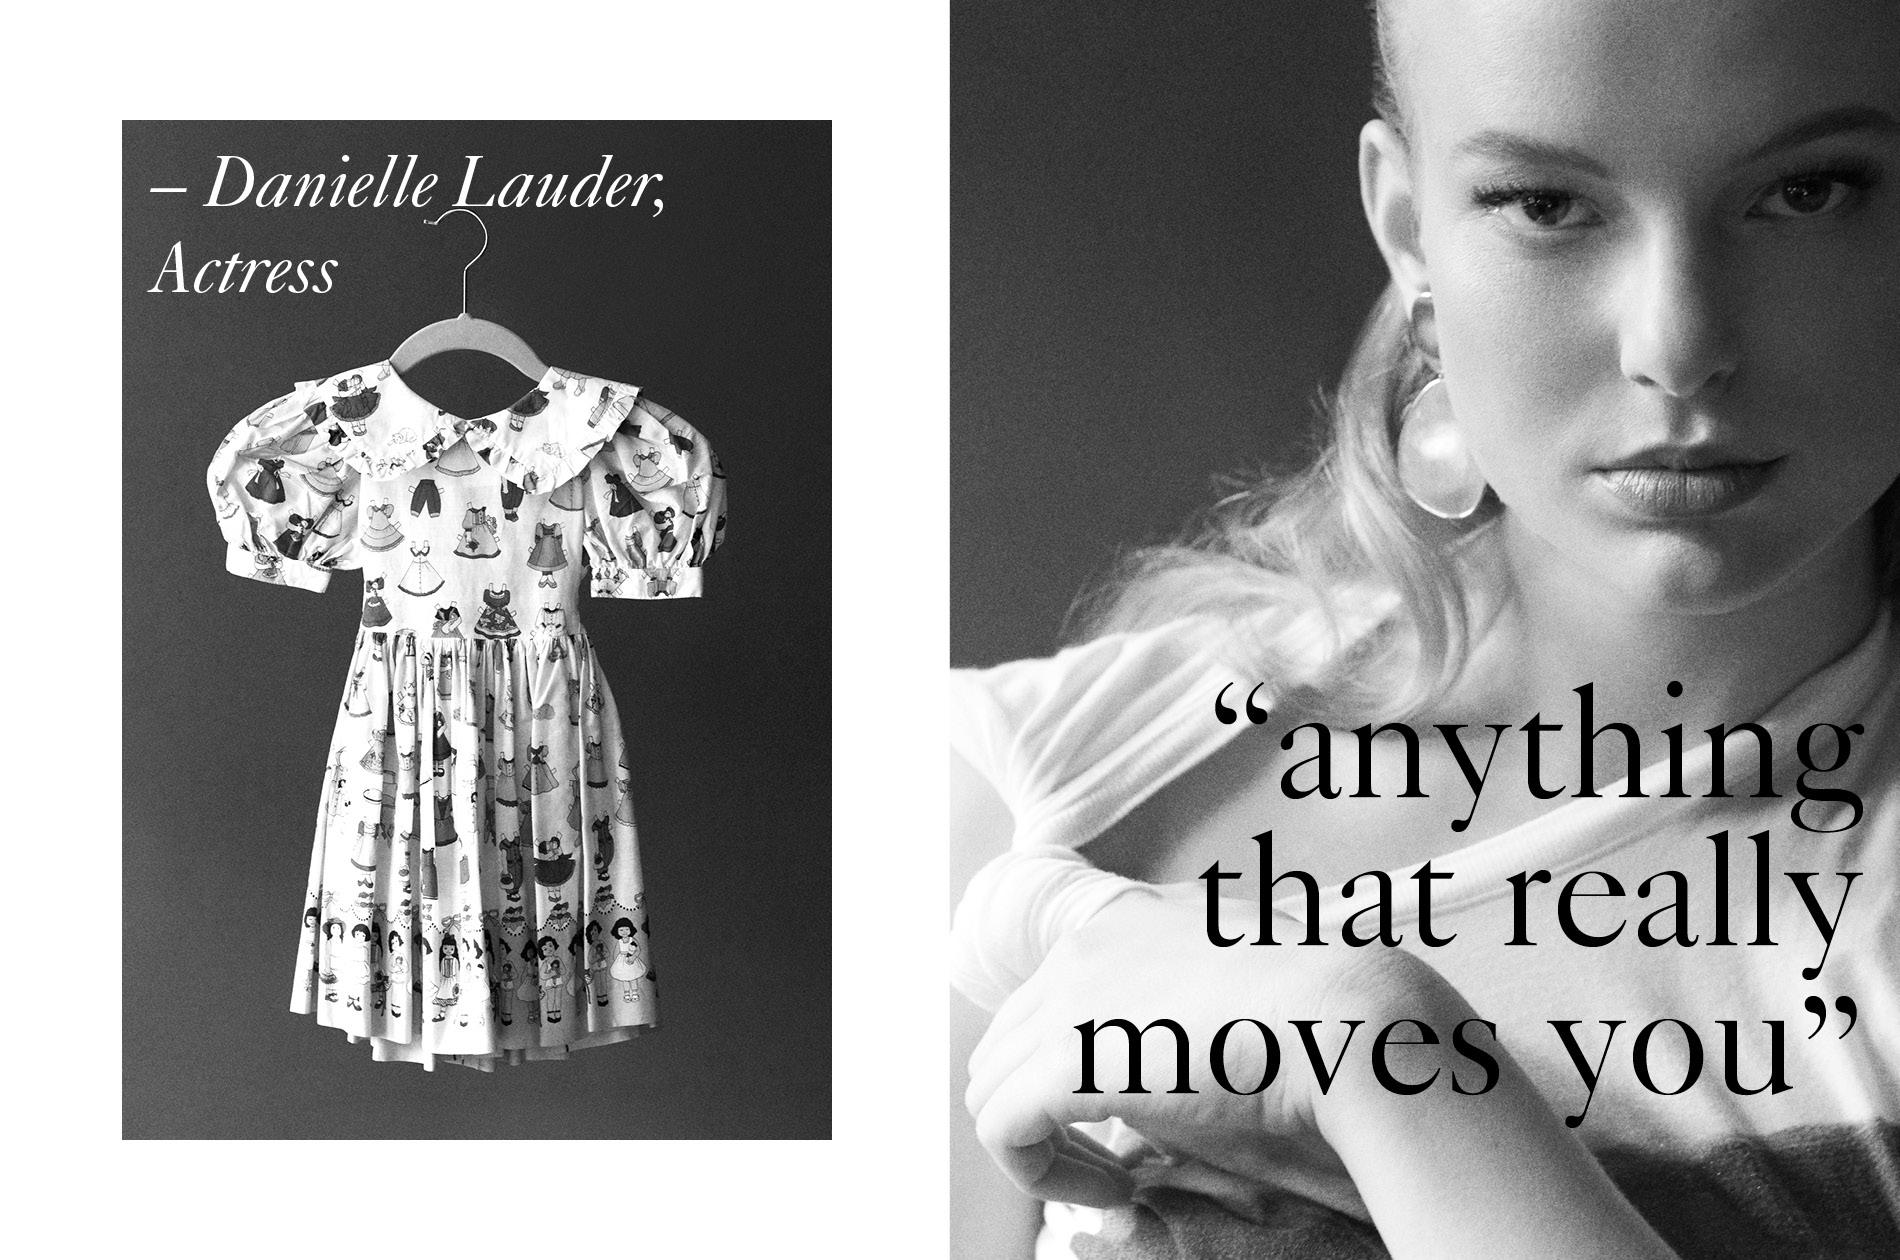 Actress Danielle Lauder featured on Masthead Magazine's Issue 1 On: Beauty.